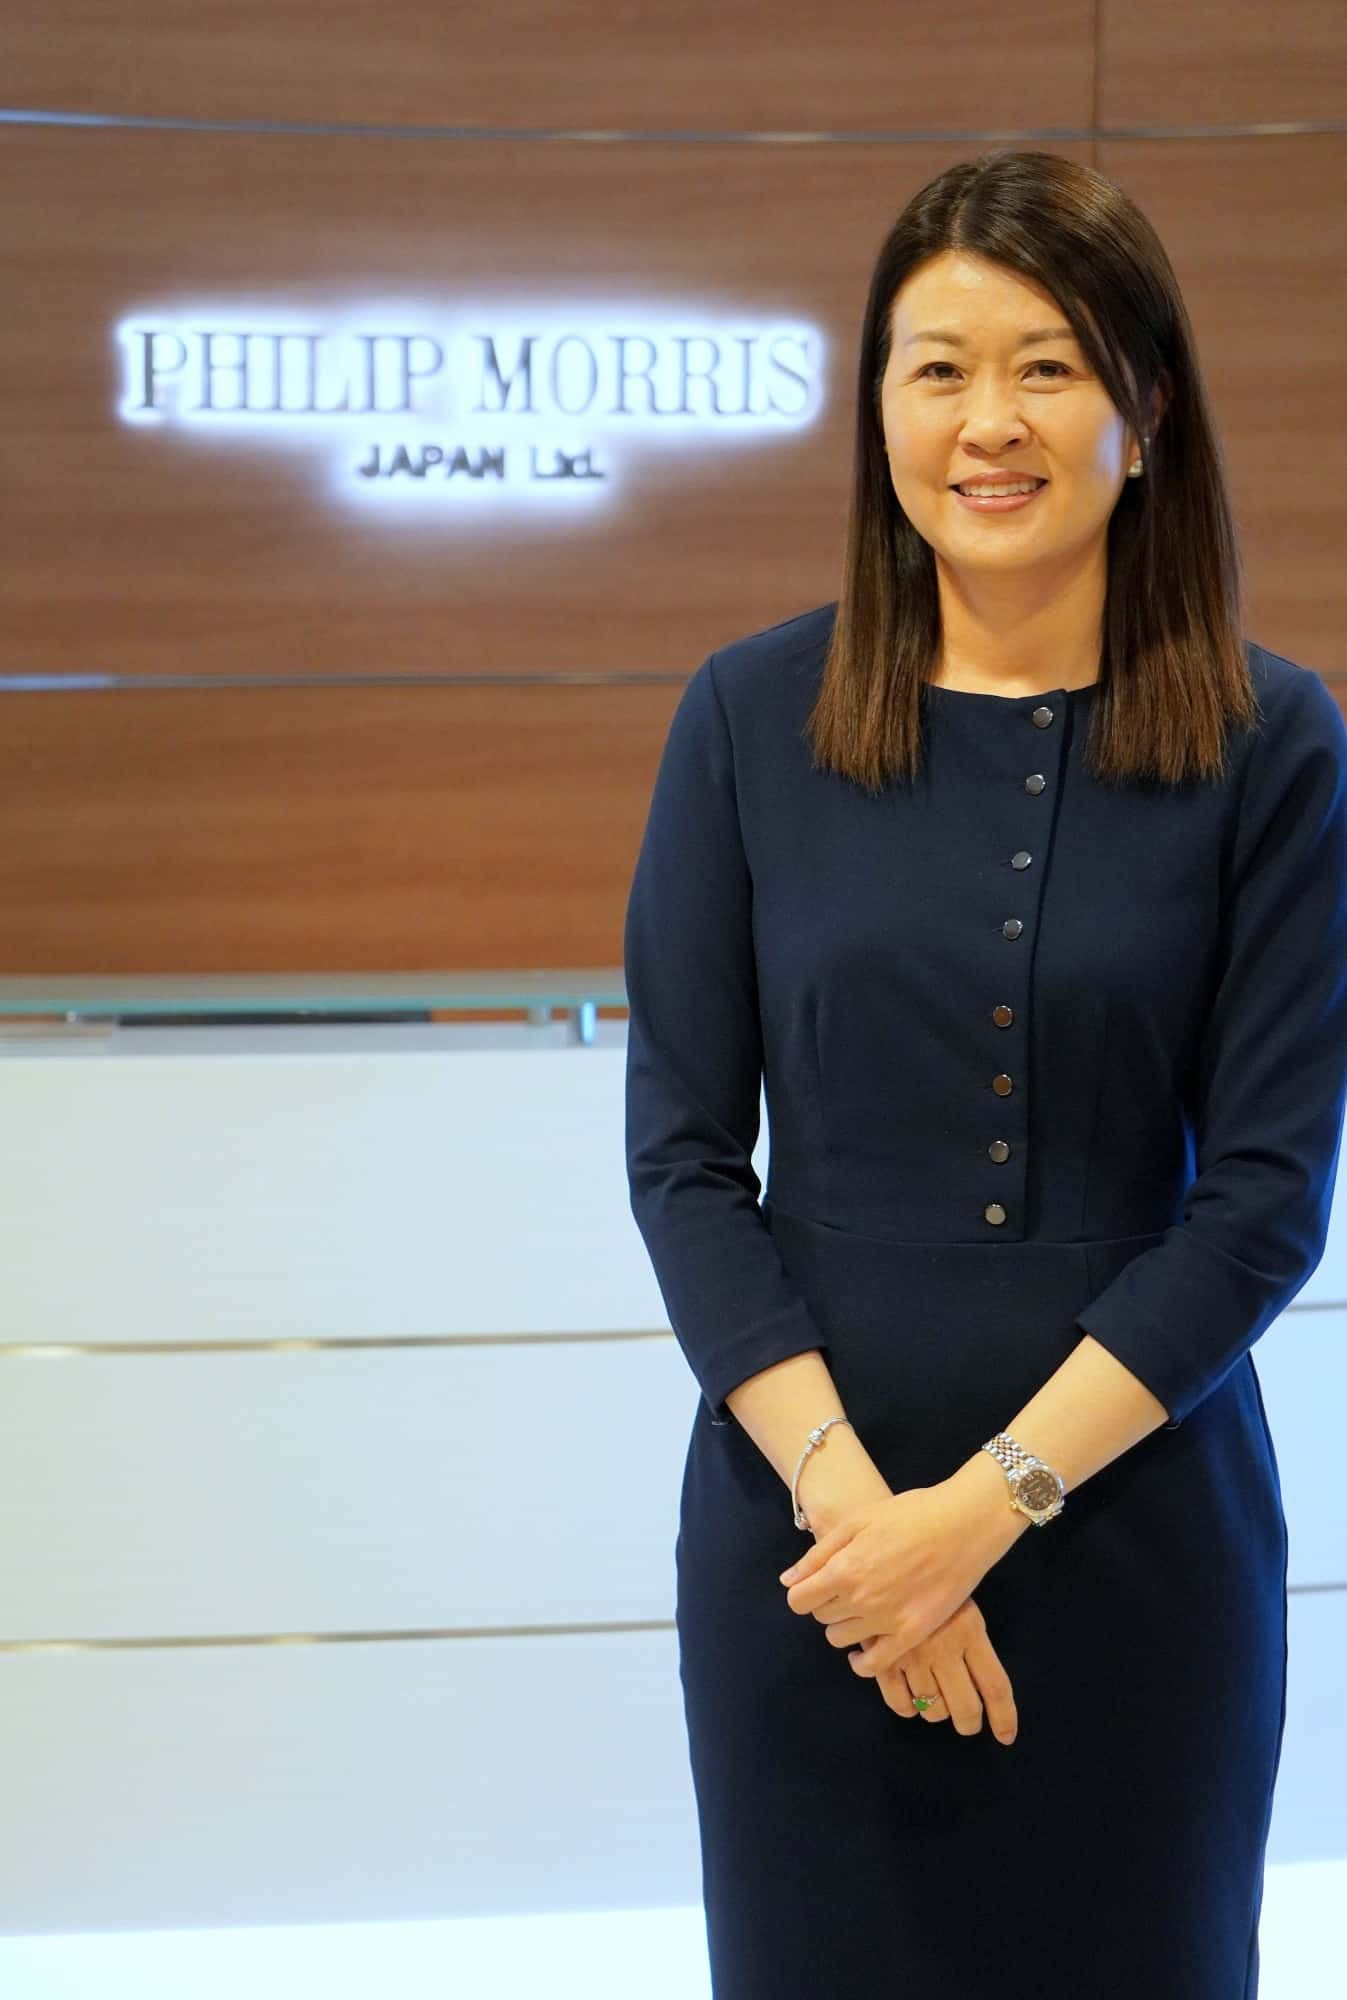 Shea Lih Goh PMI Japan